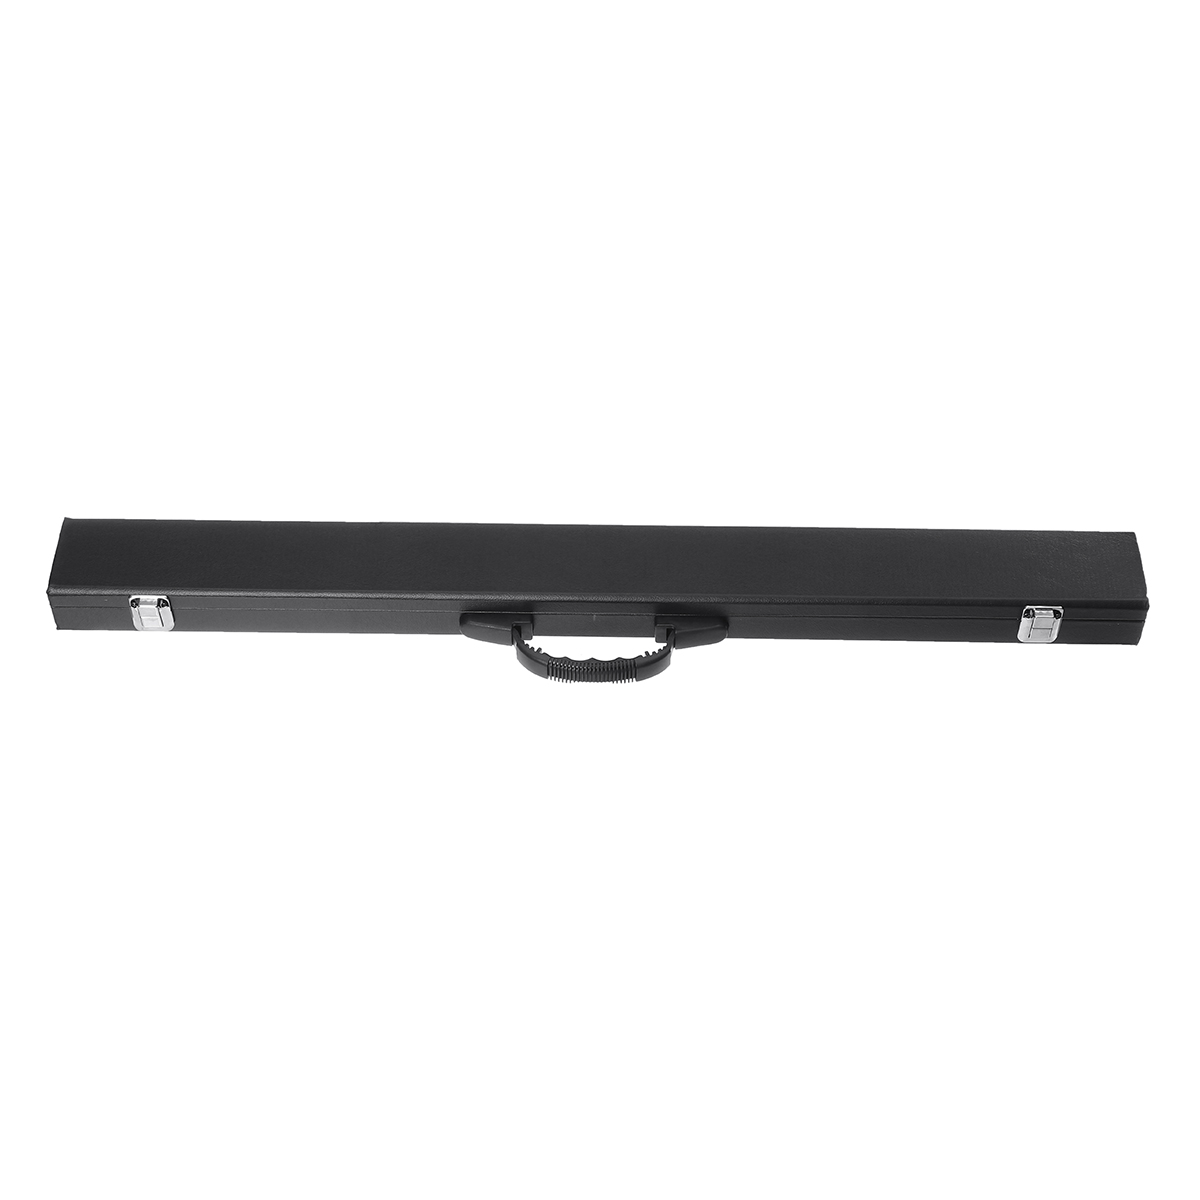 "1/2"" Pool Cue Hard Case For Pool Snooker Billiard Box 85cm/33.5 PU Leather Black"